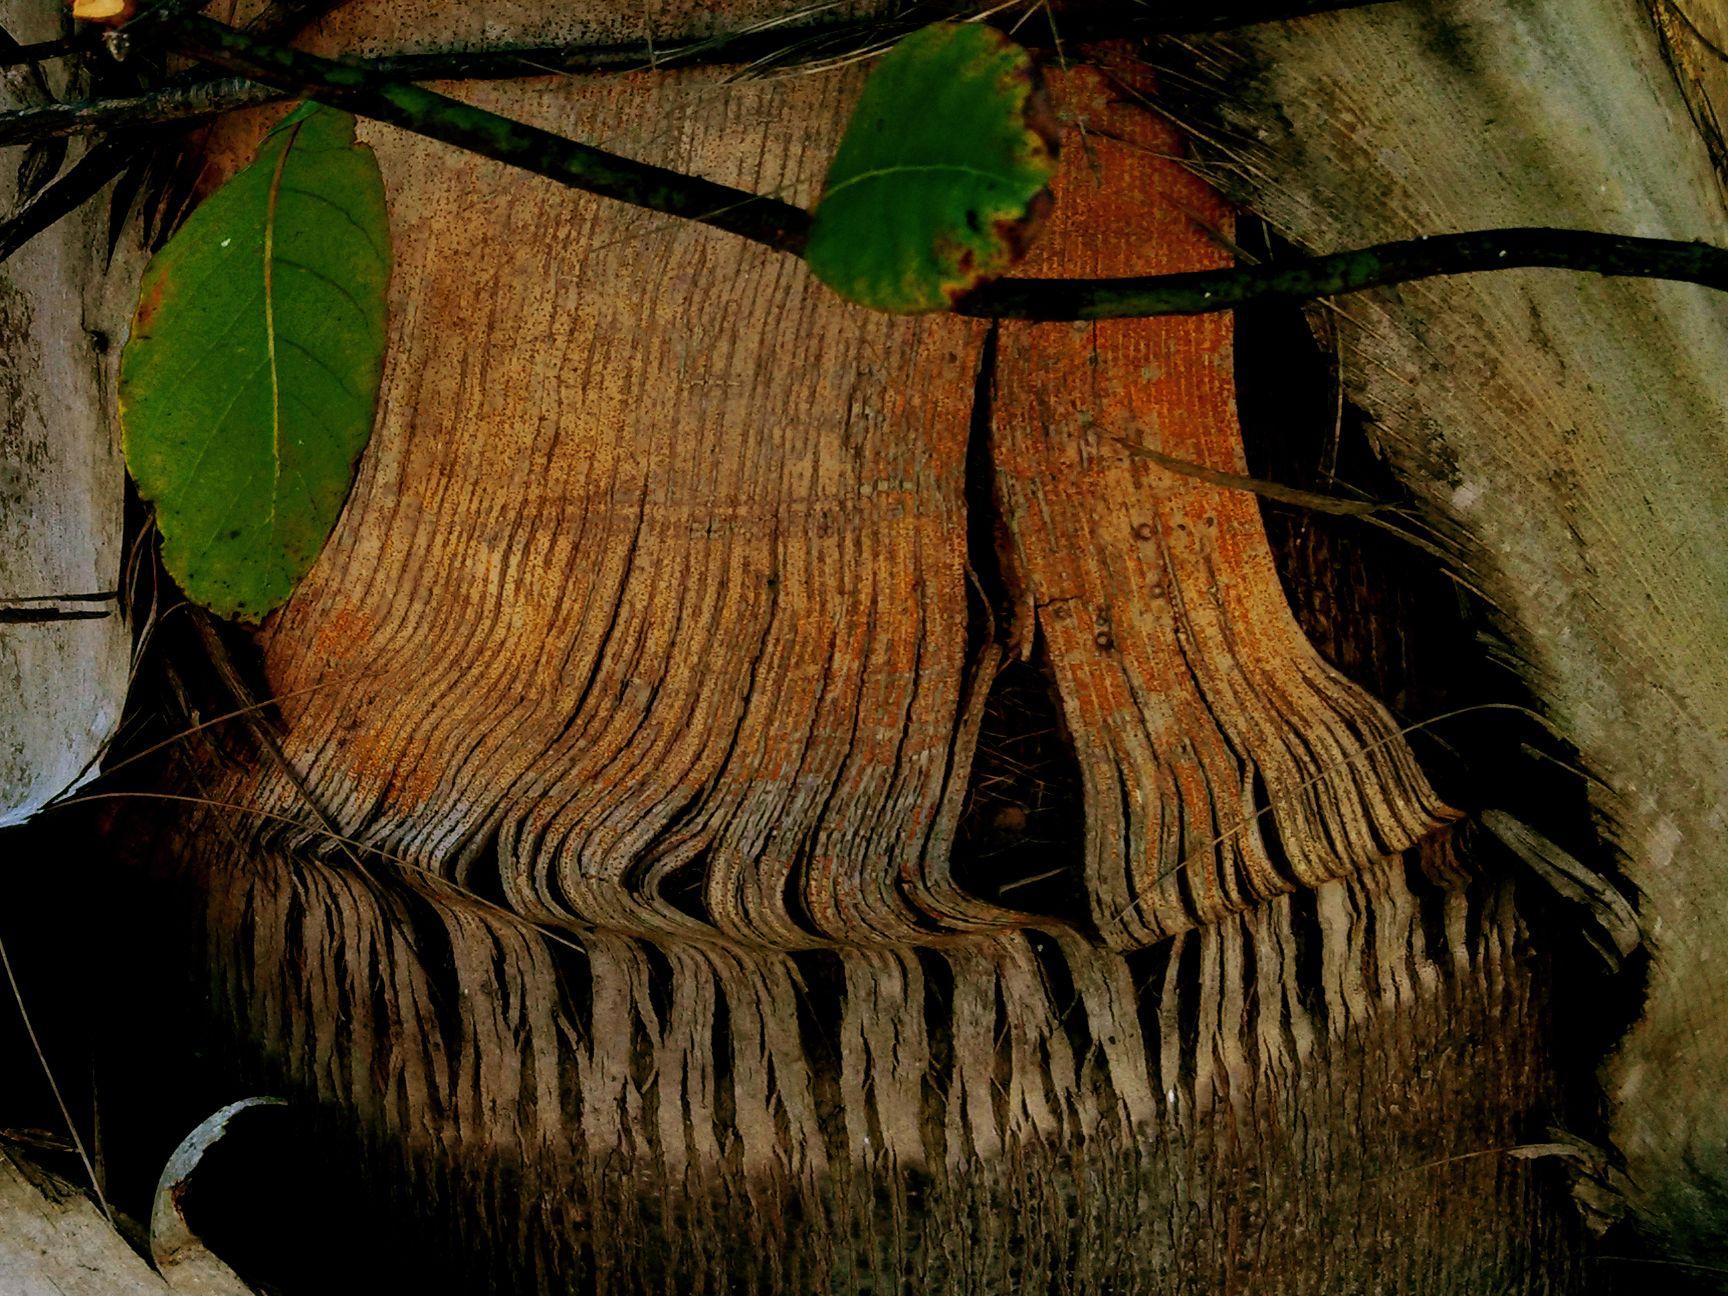 On My Walking Trail I Love Florida S Palm Tree Barks Florida Palm Trees Nature Palm Trees